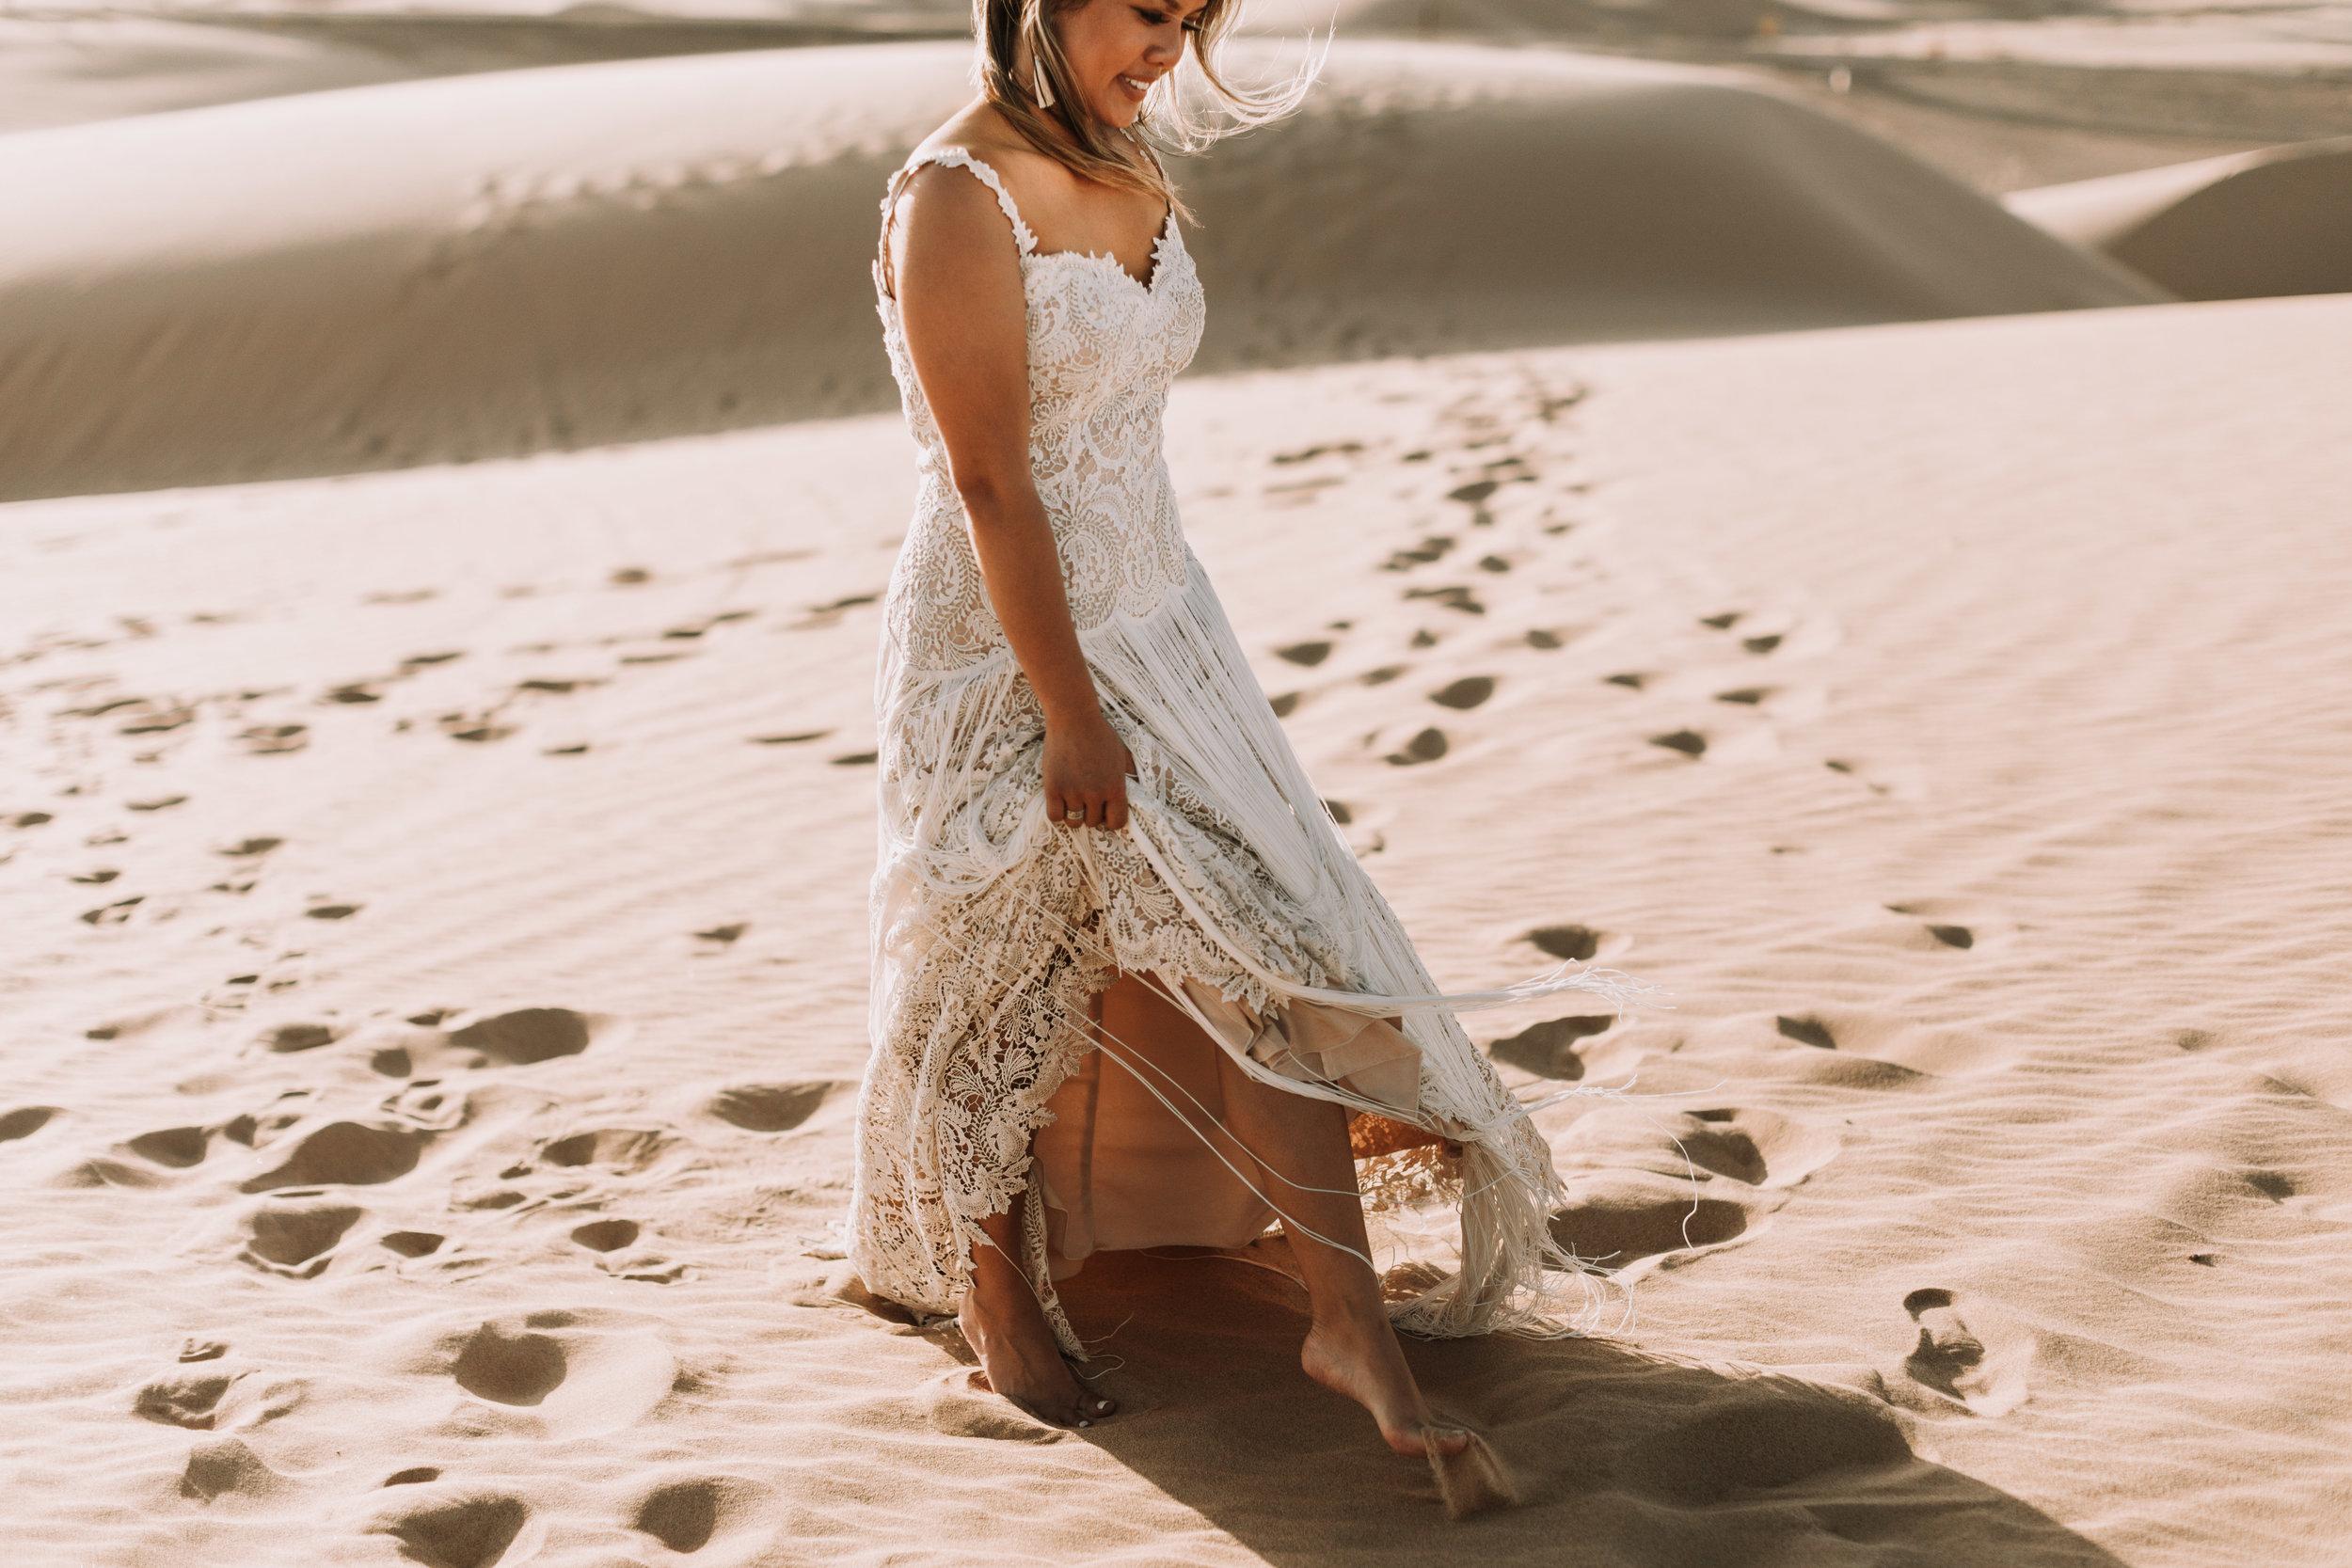 imperial sand dunes destination styled elopement wedding lillian west fringe bridal gown